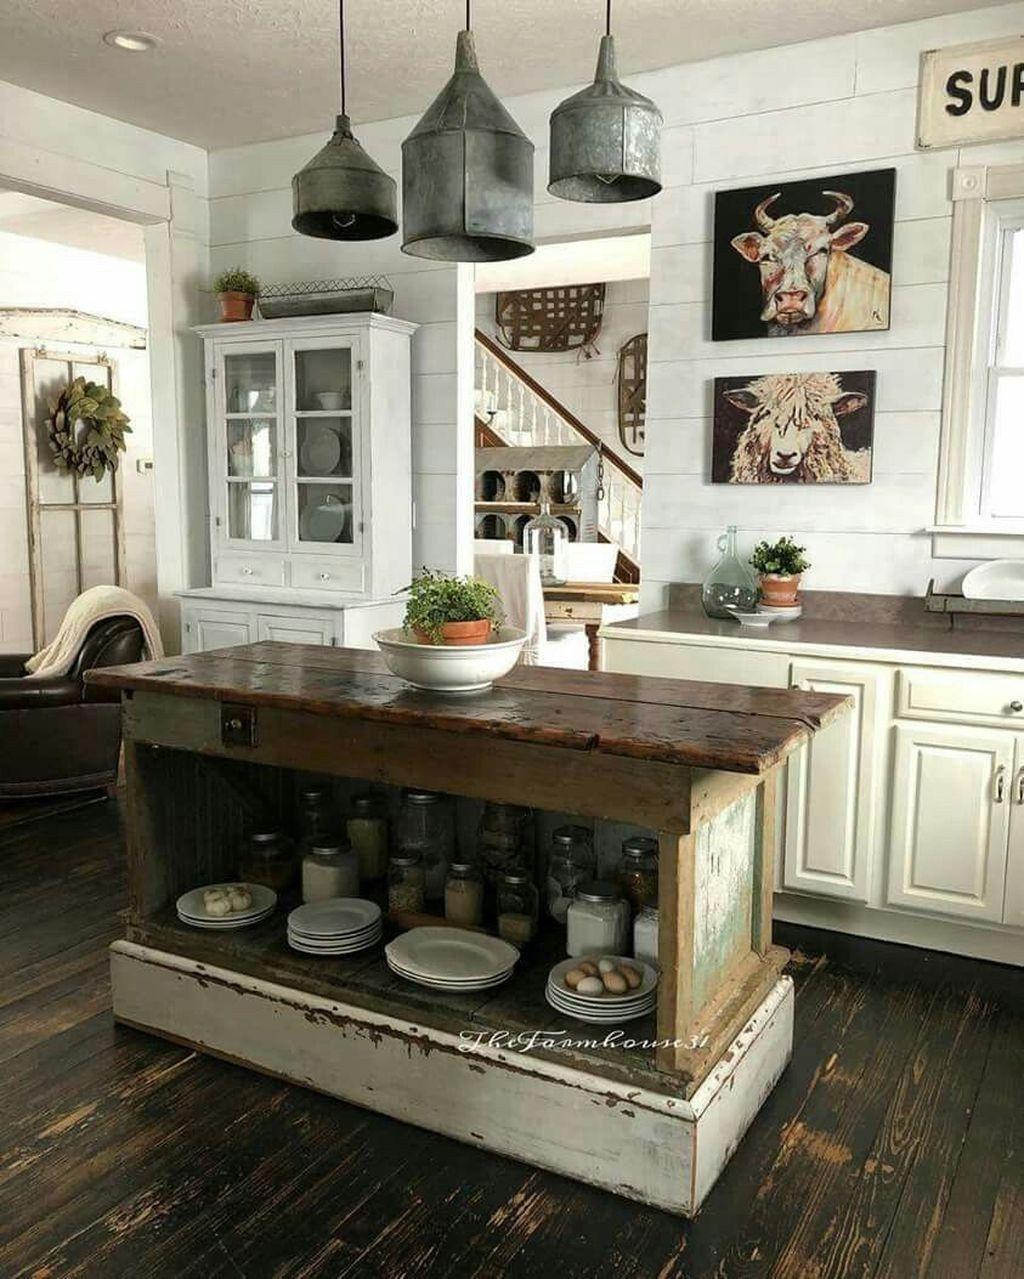 Bead board cabinets Old kitchen island Butcher